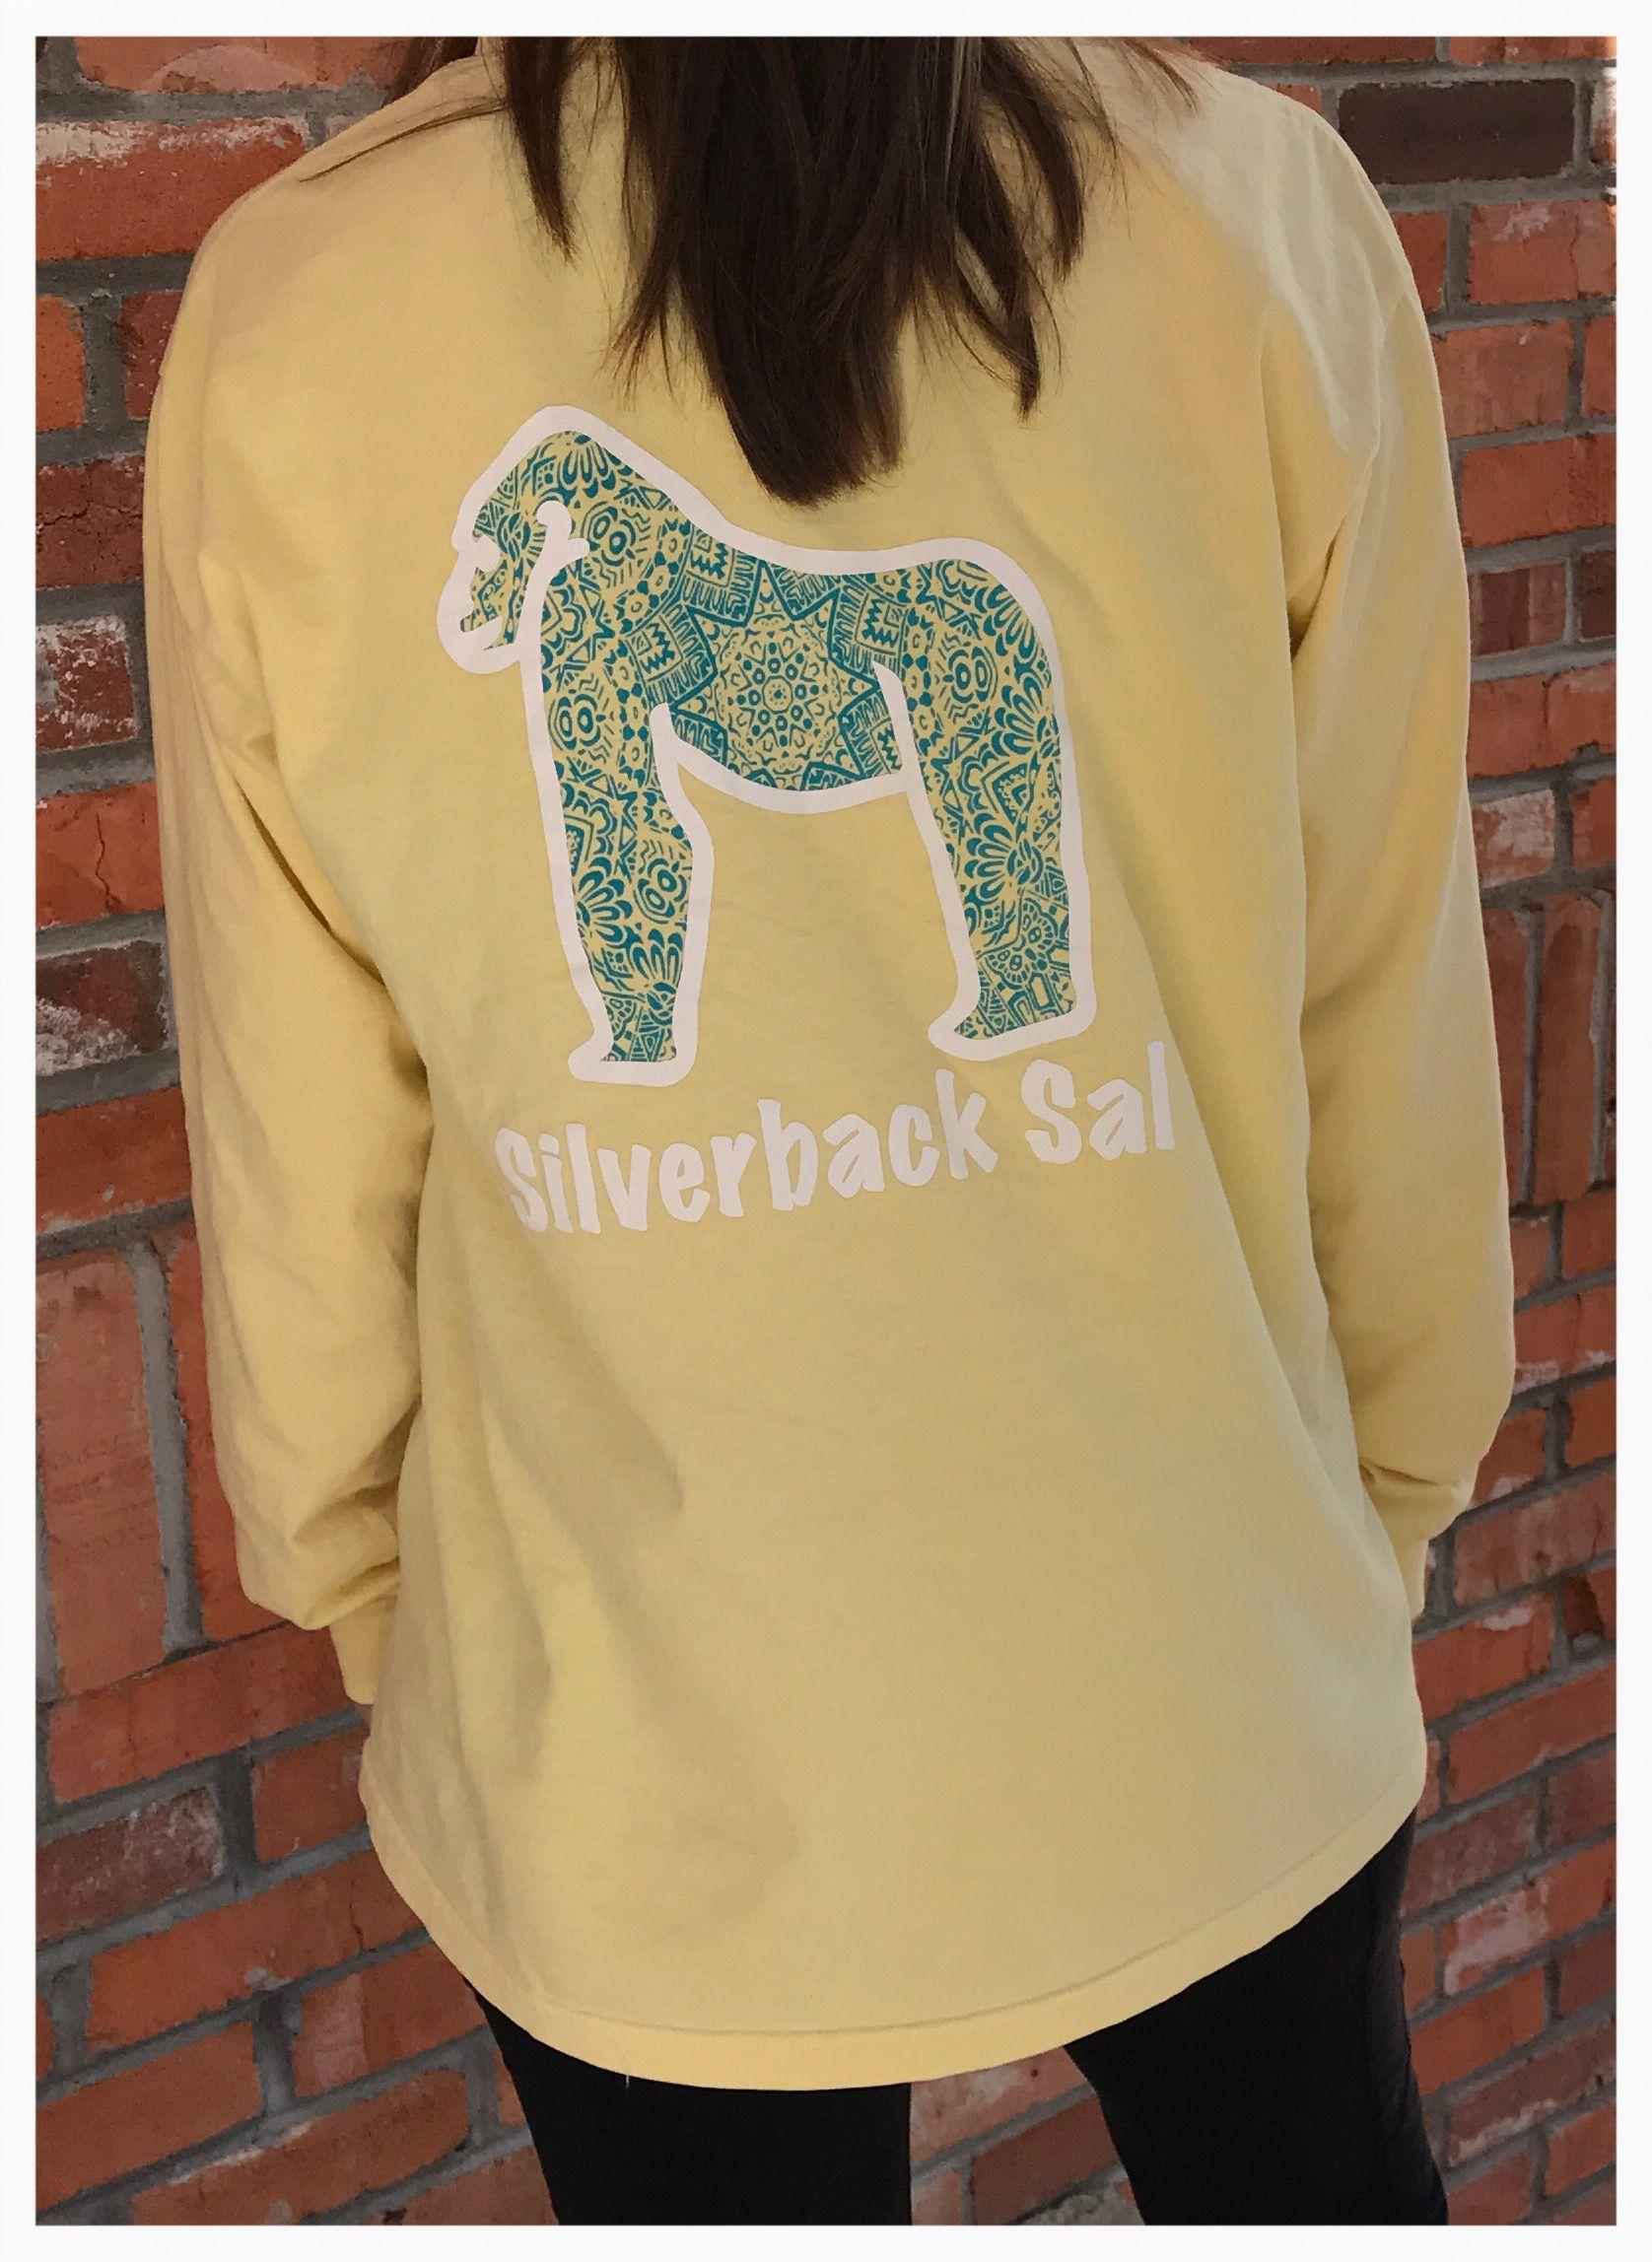 f46651afa891d Silverback Sal banana yellow long sleeve hand dyed shirt. Very comfortable  100% cotton!